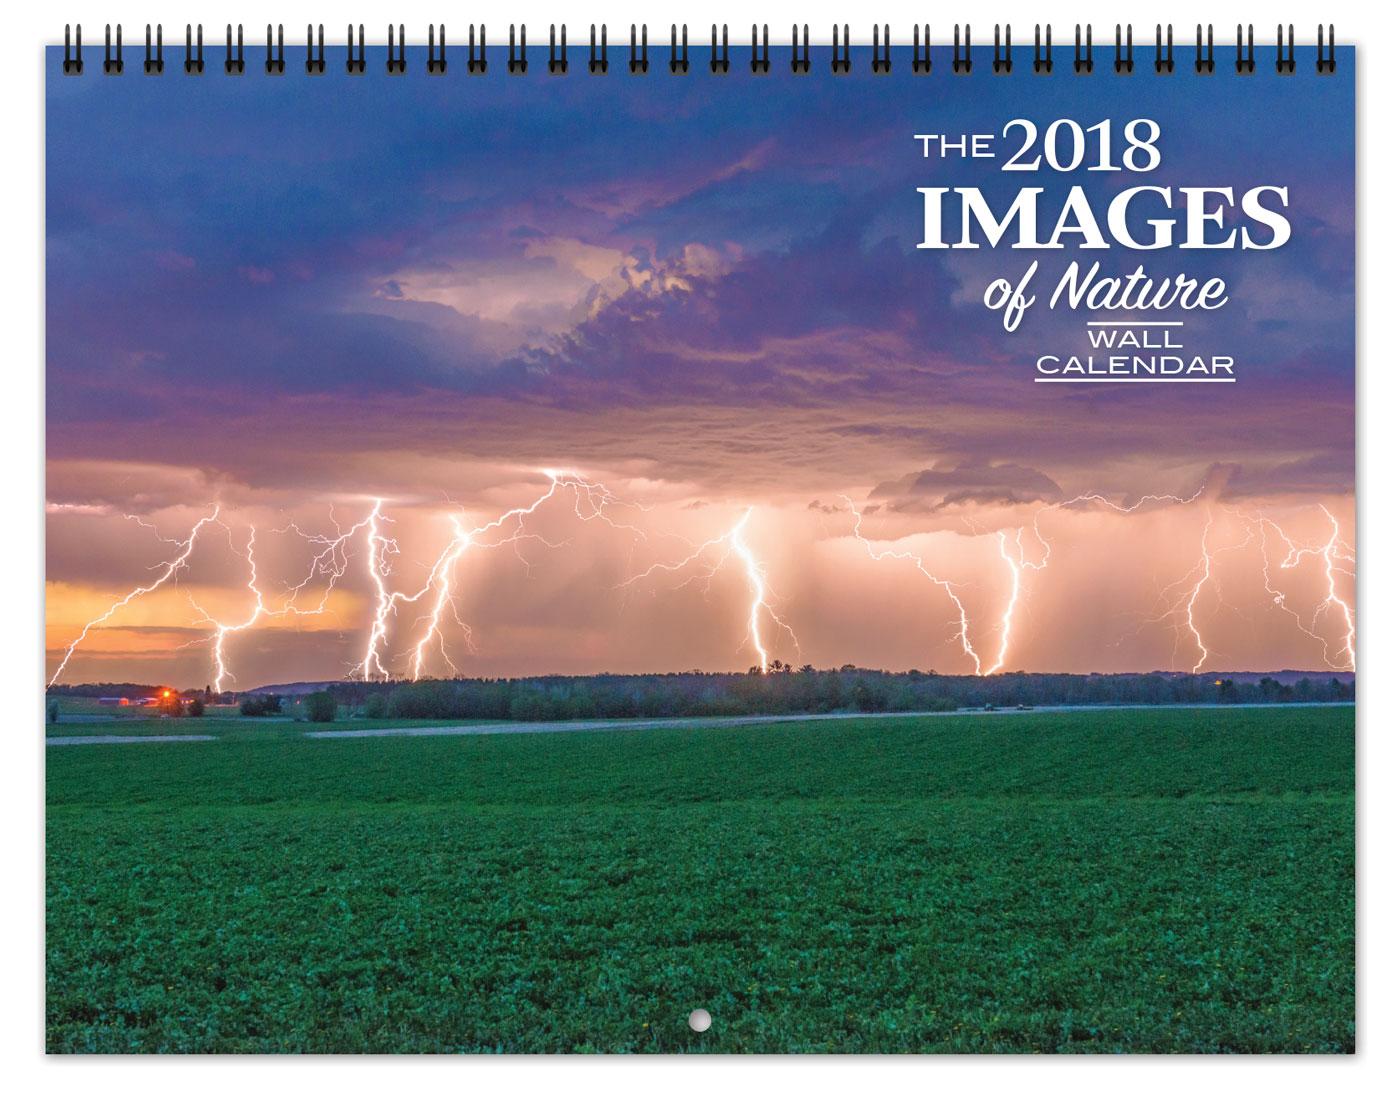 Calendar Wallpaper Nature : Images of nature calendar farley company